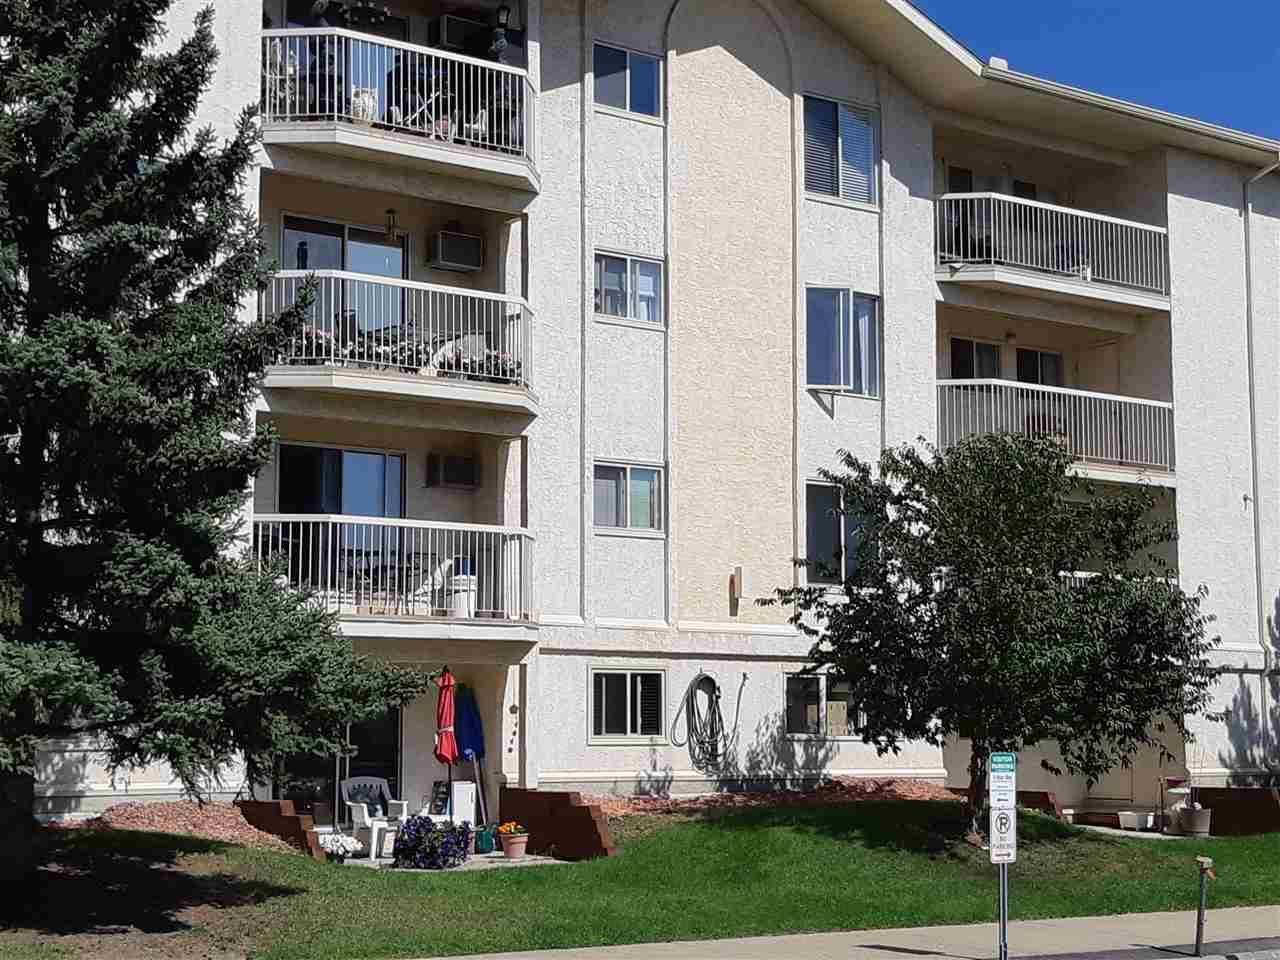 408 - 18012 95 Avenue Nw, Edmonton   Image 2